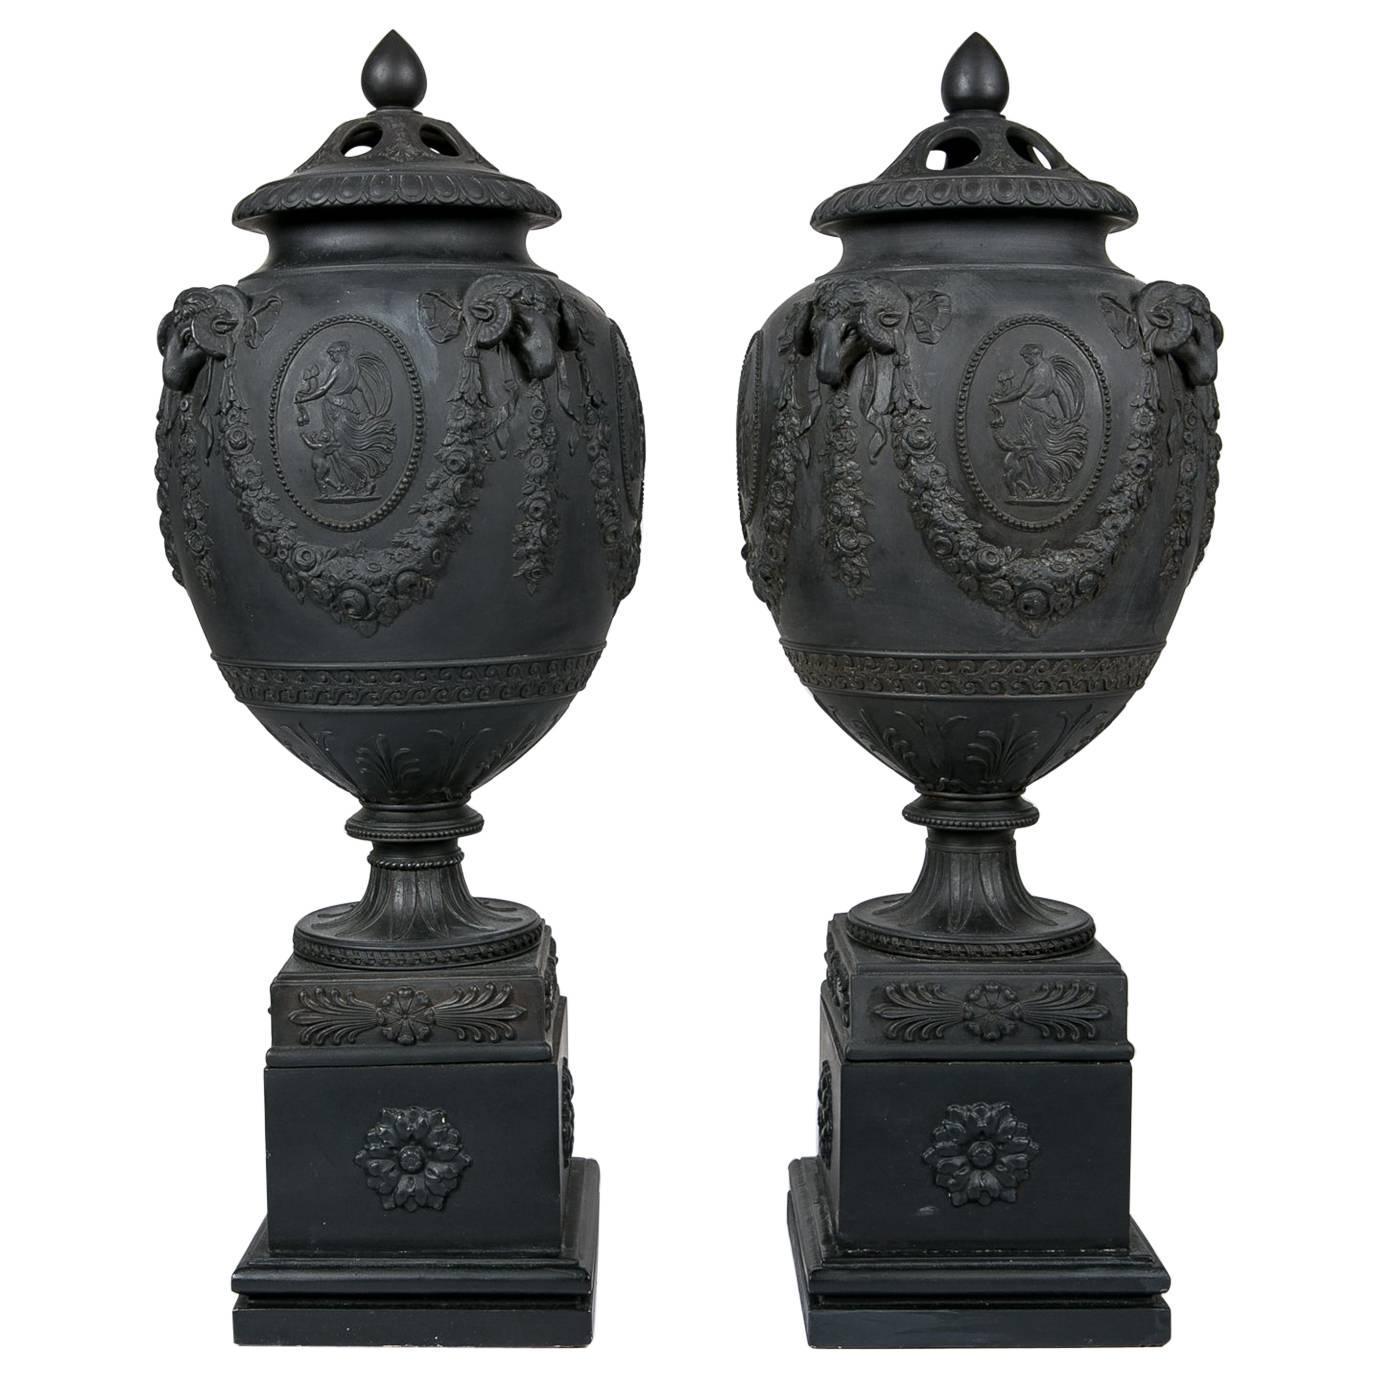 Wedgwood Black Basalt Urns Made in England circa 1820